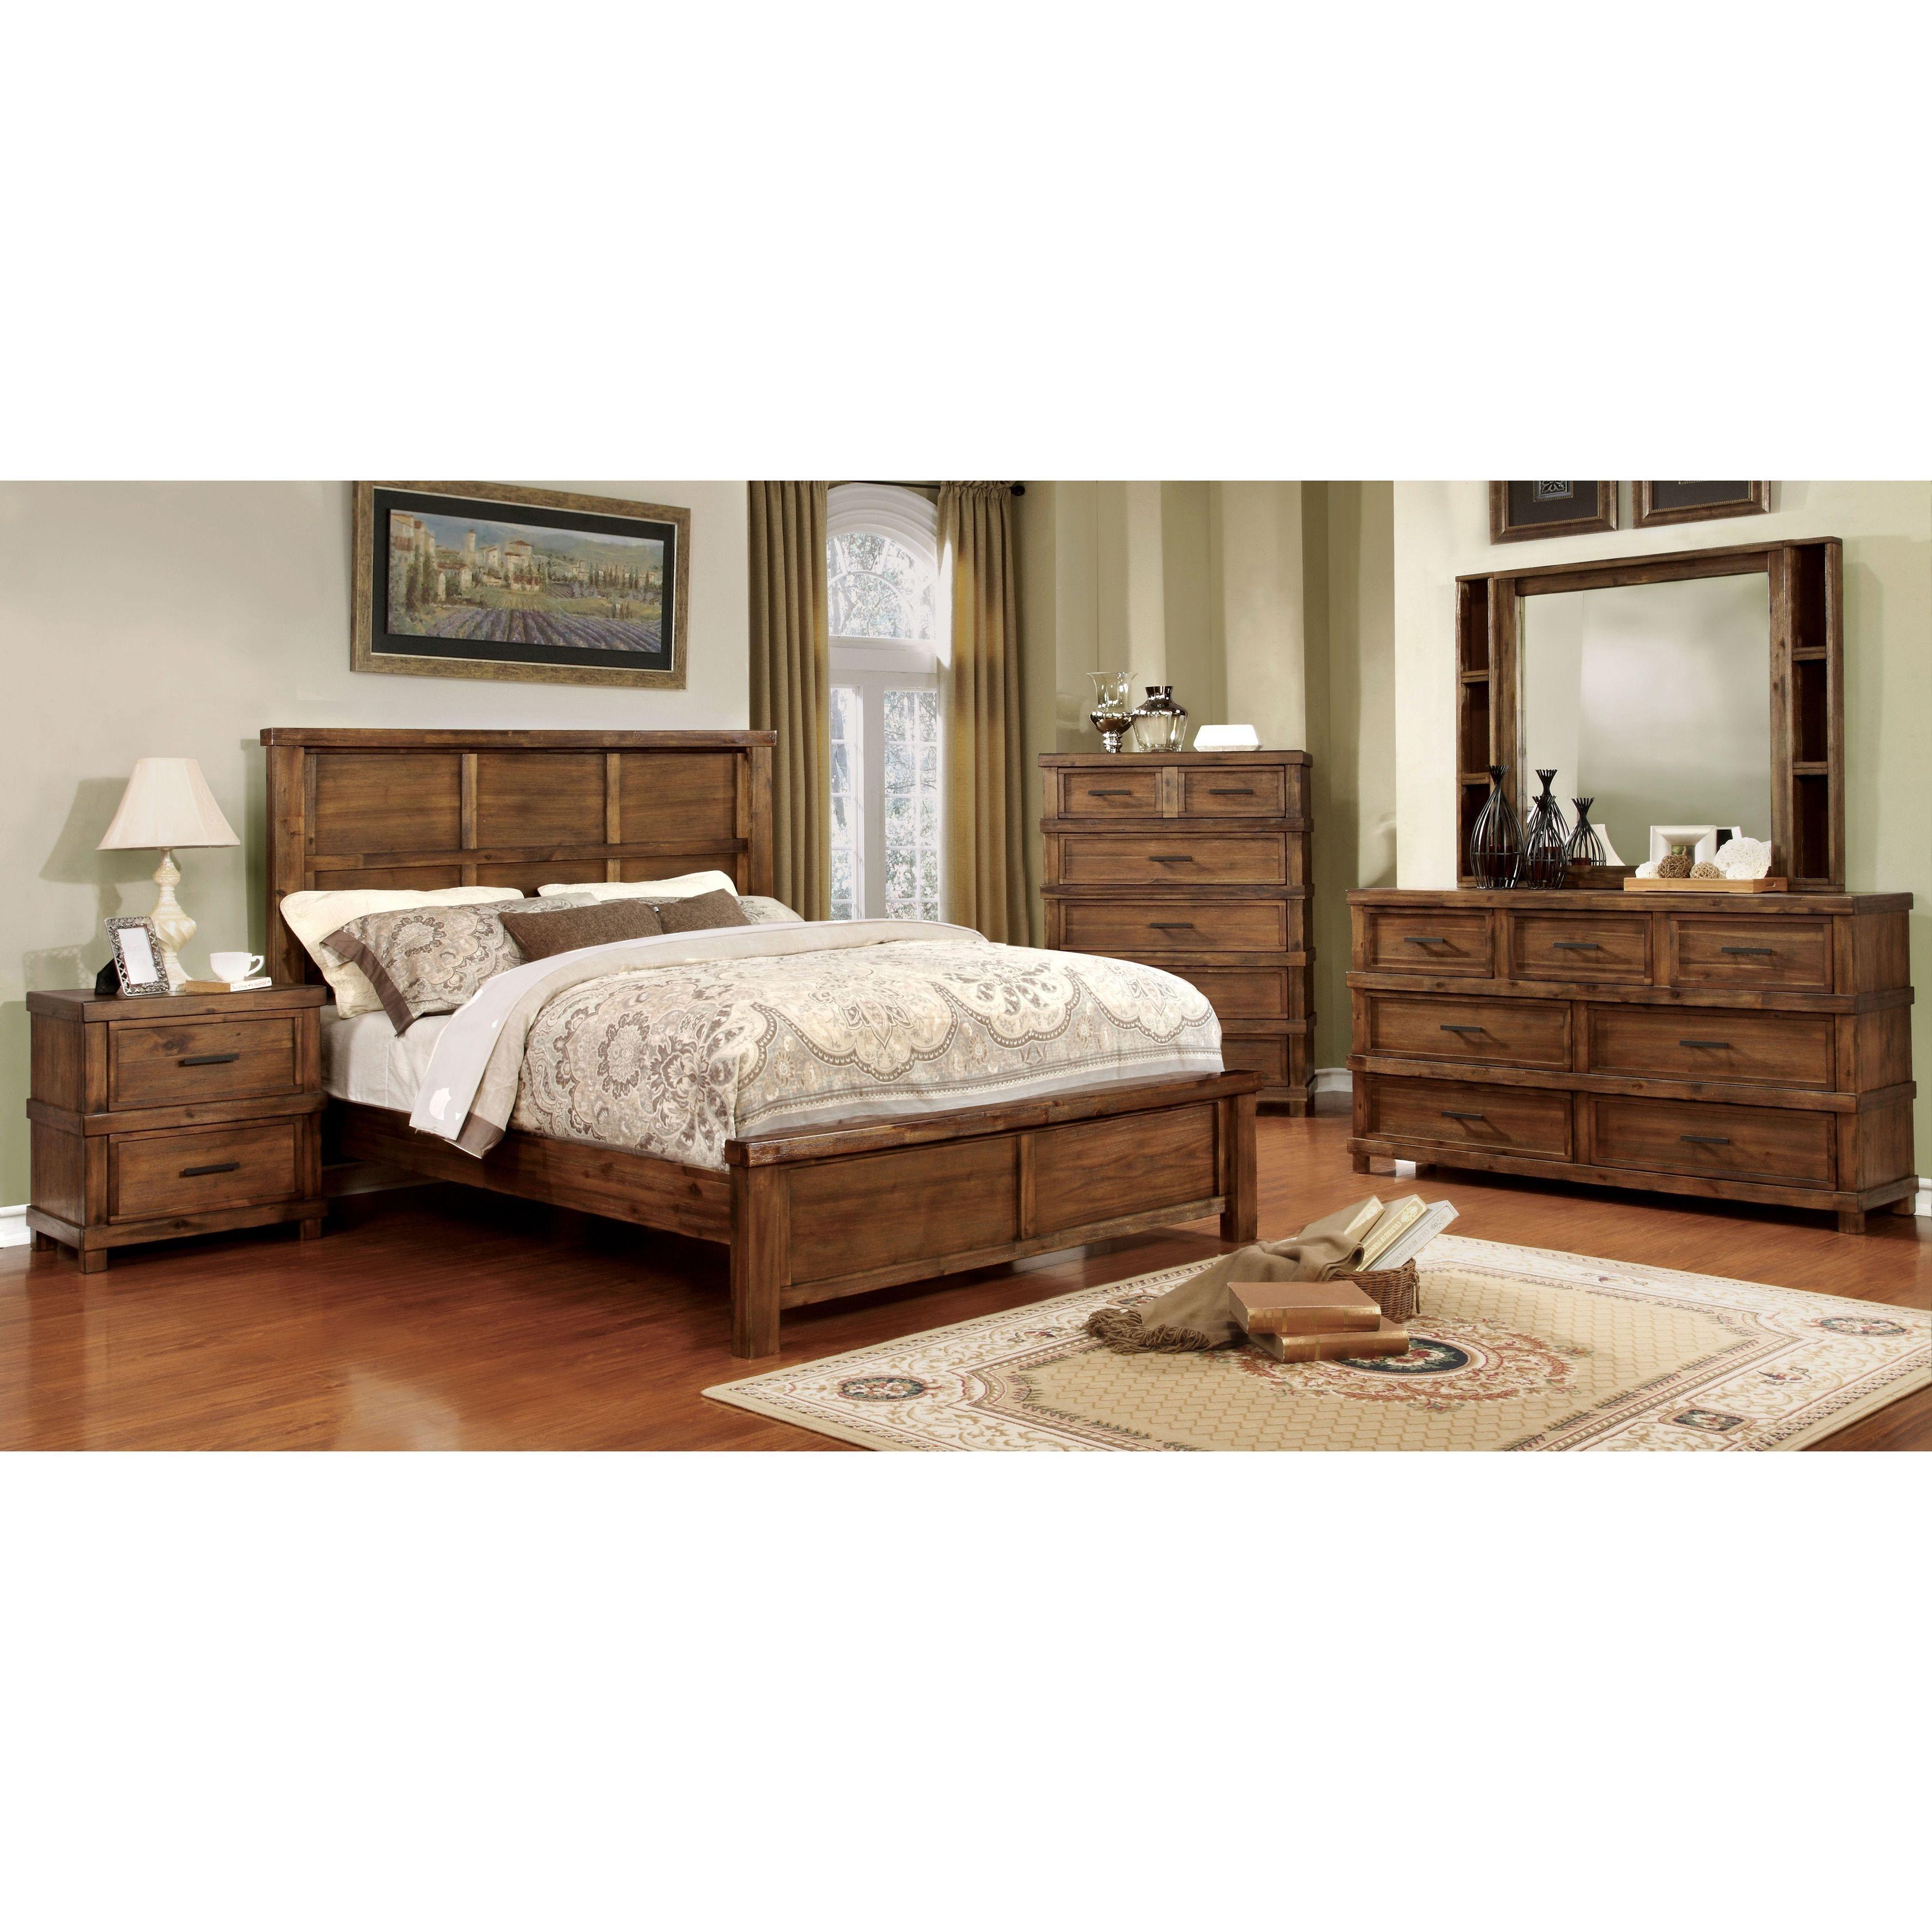 Furniture of America Stamson Rustic 4-piece Antique Oak Bedroom Set ...